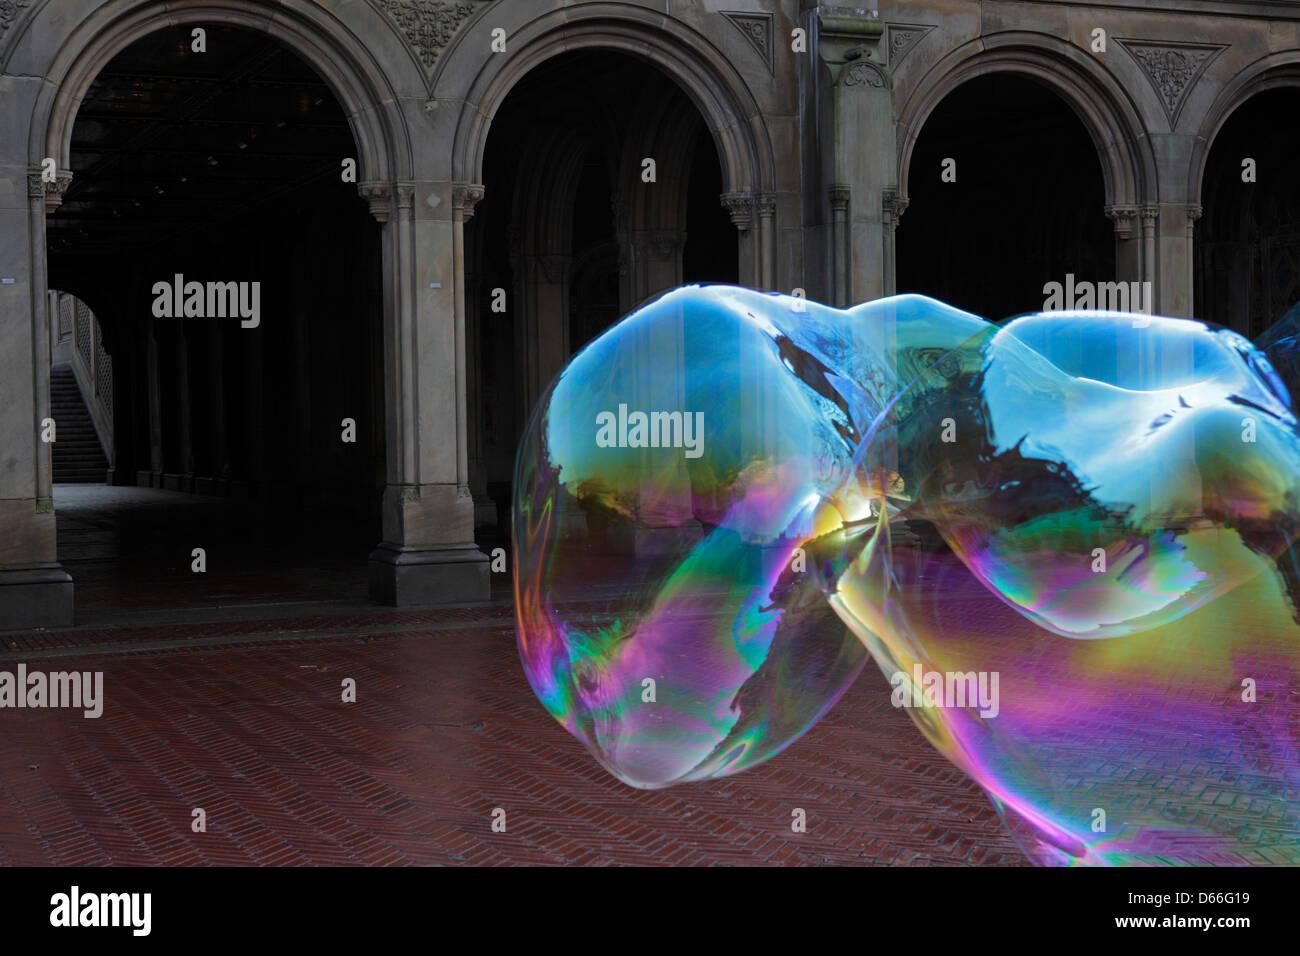 Colorido Soap Bubble en Central Park, New York City Imagen De Stock